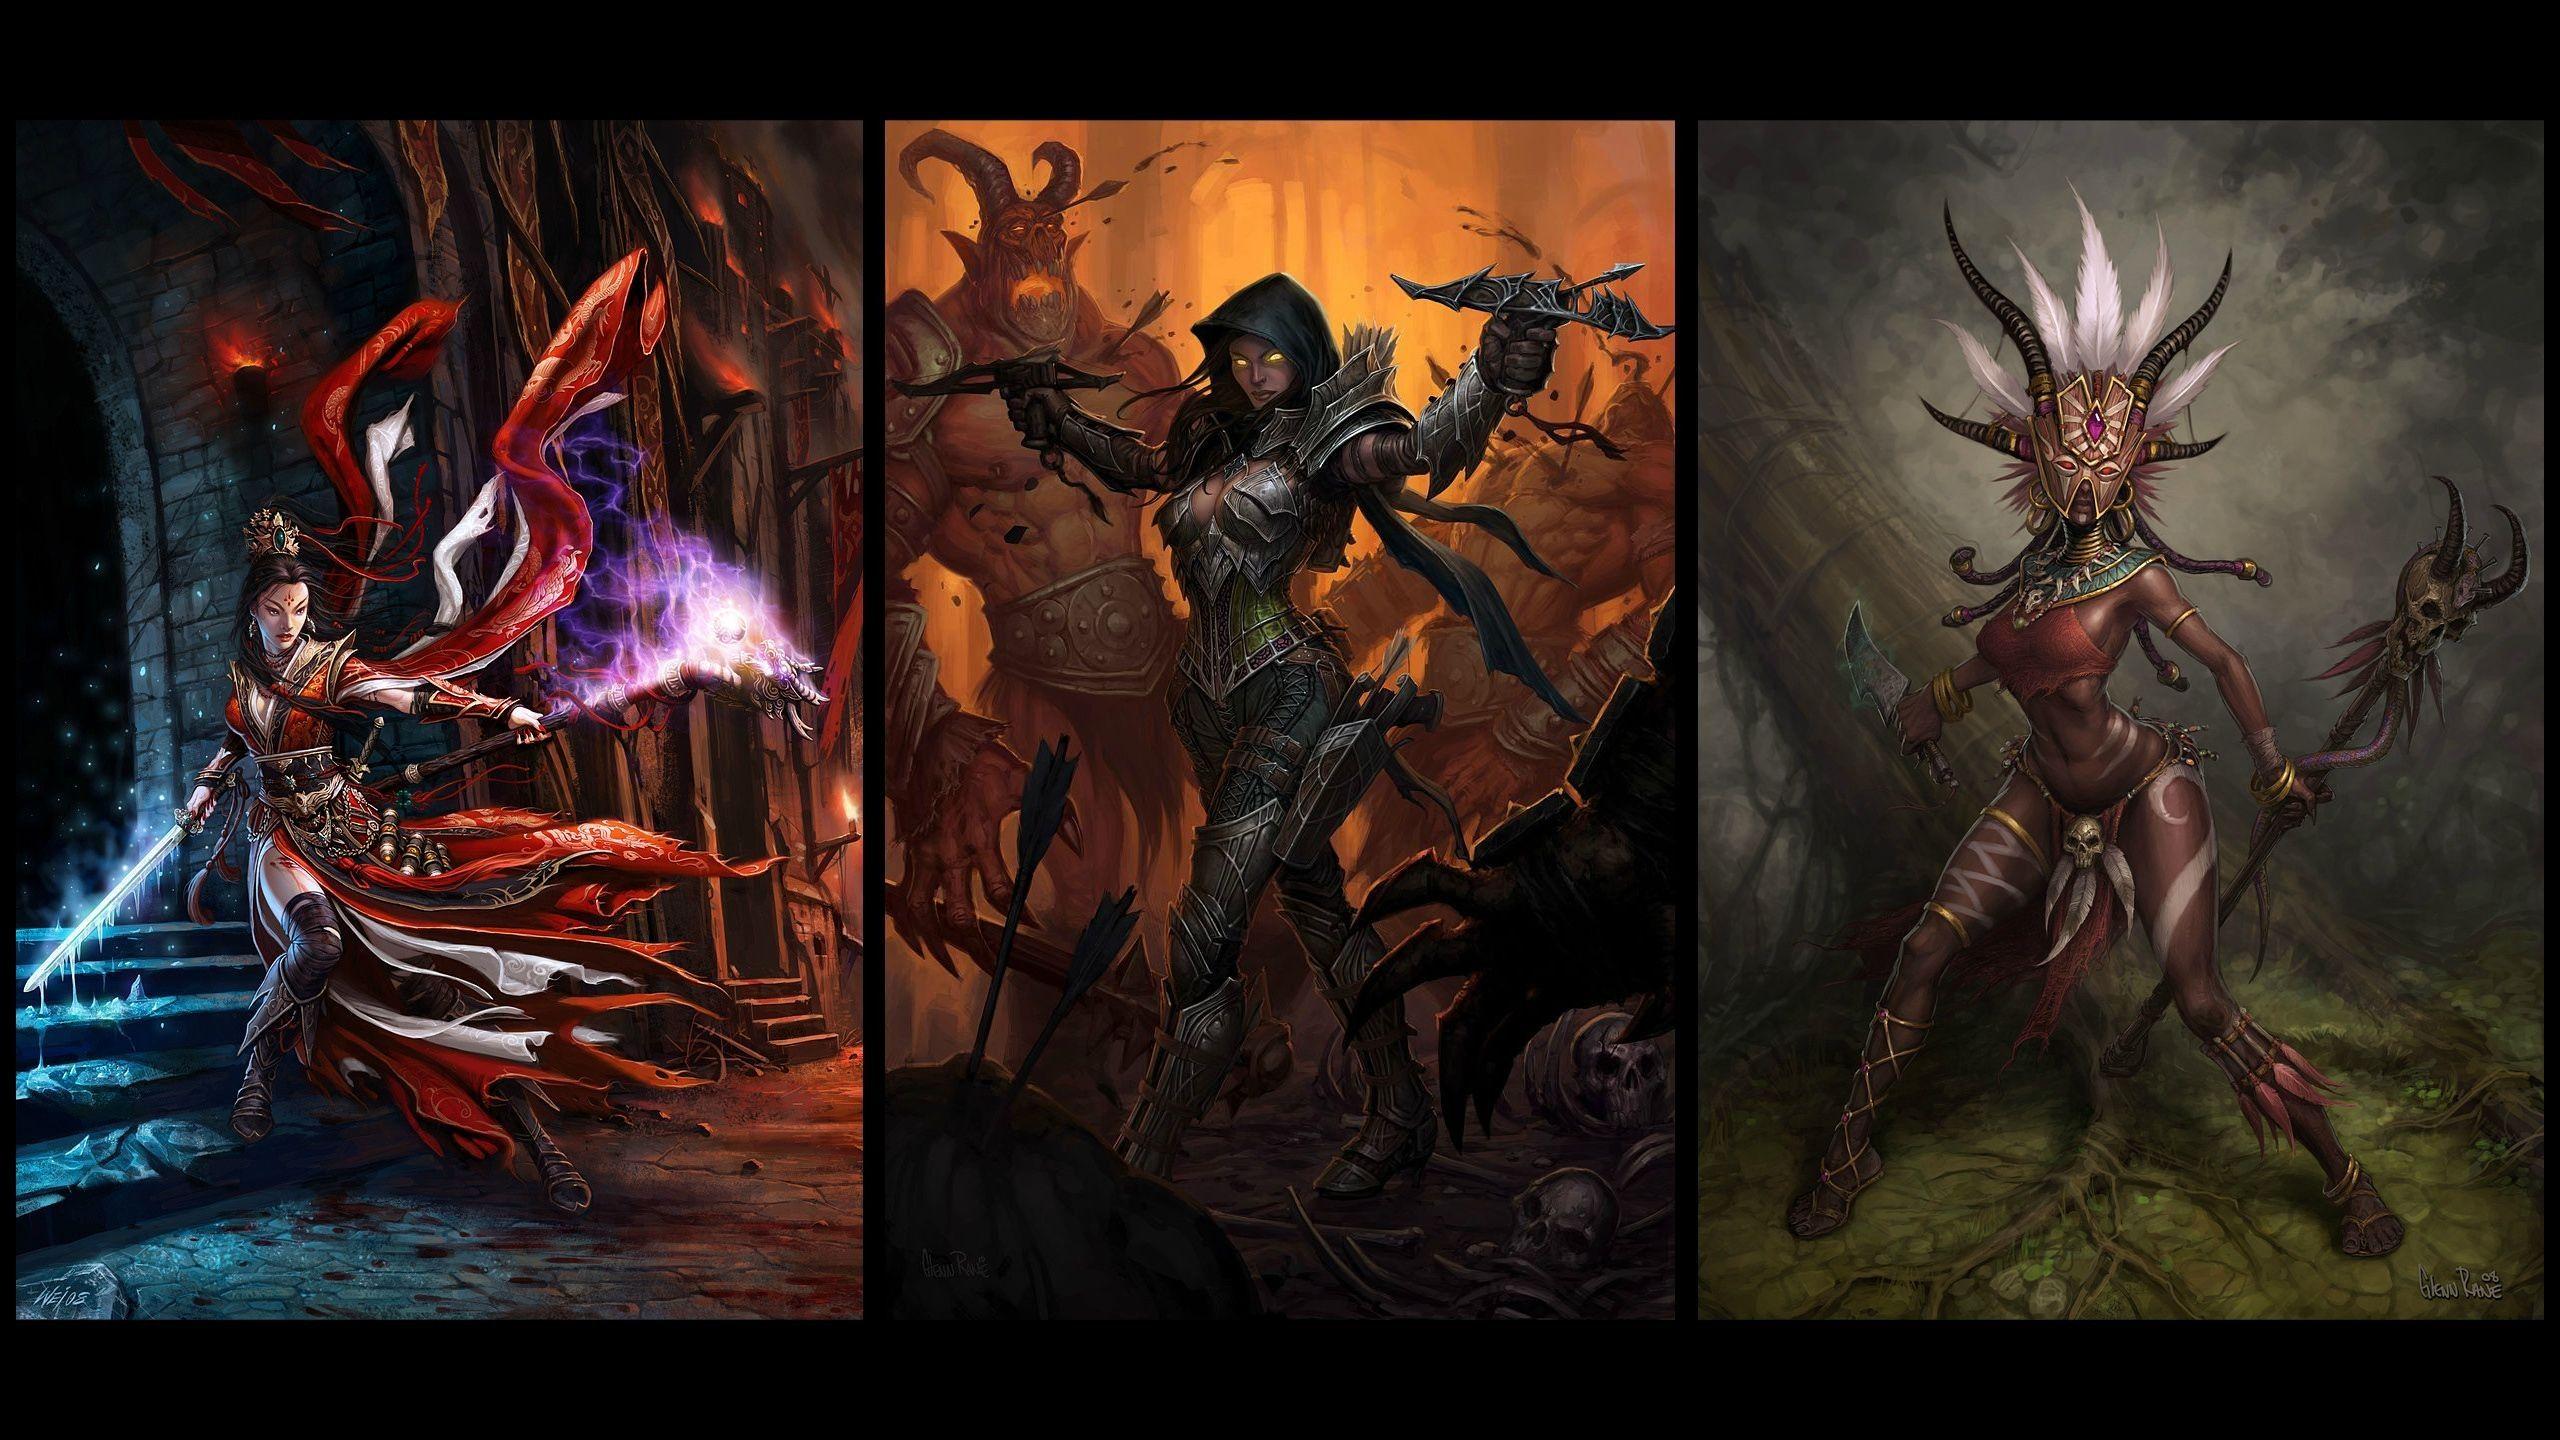 wallpaper game art references pinterest concept art art and